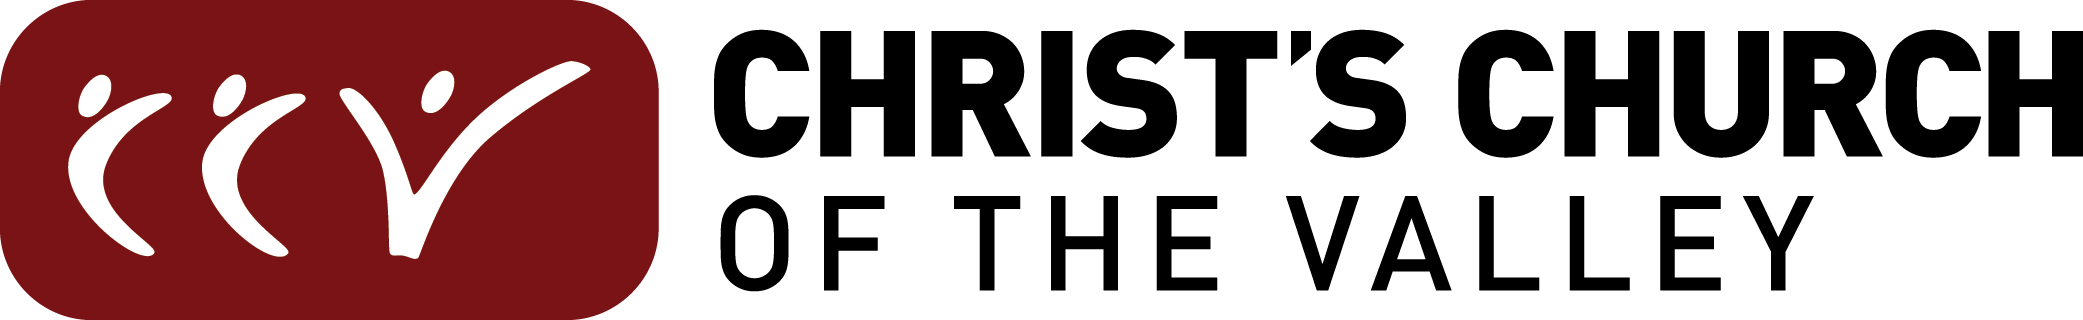 Ccv color logo